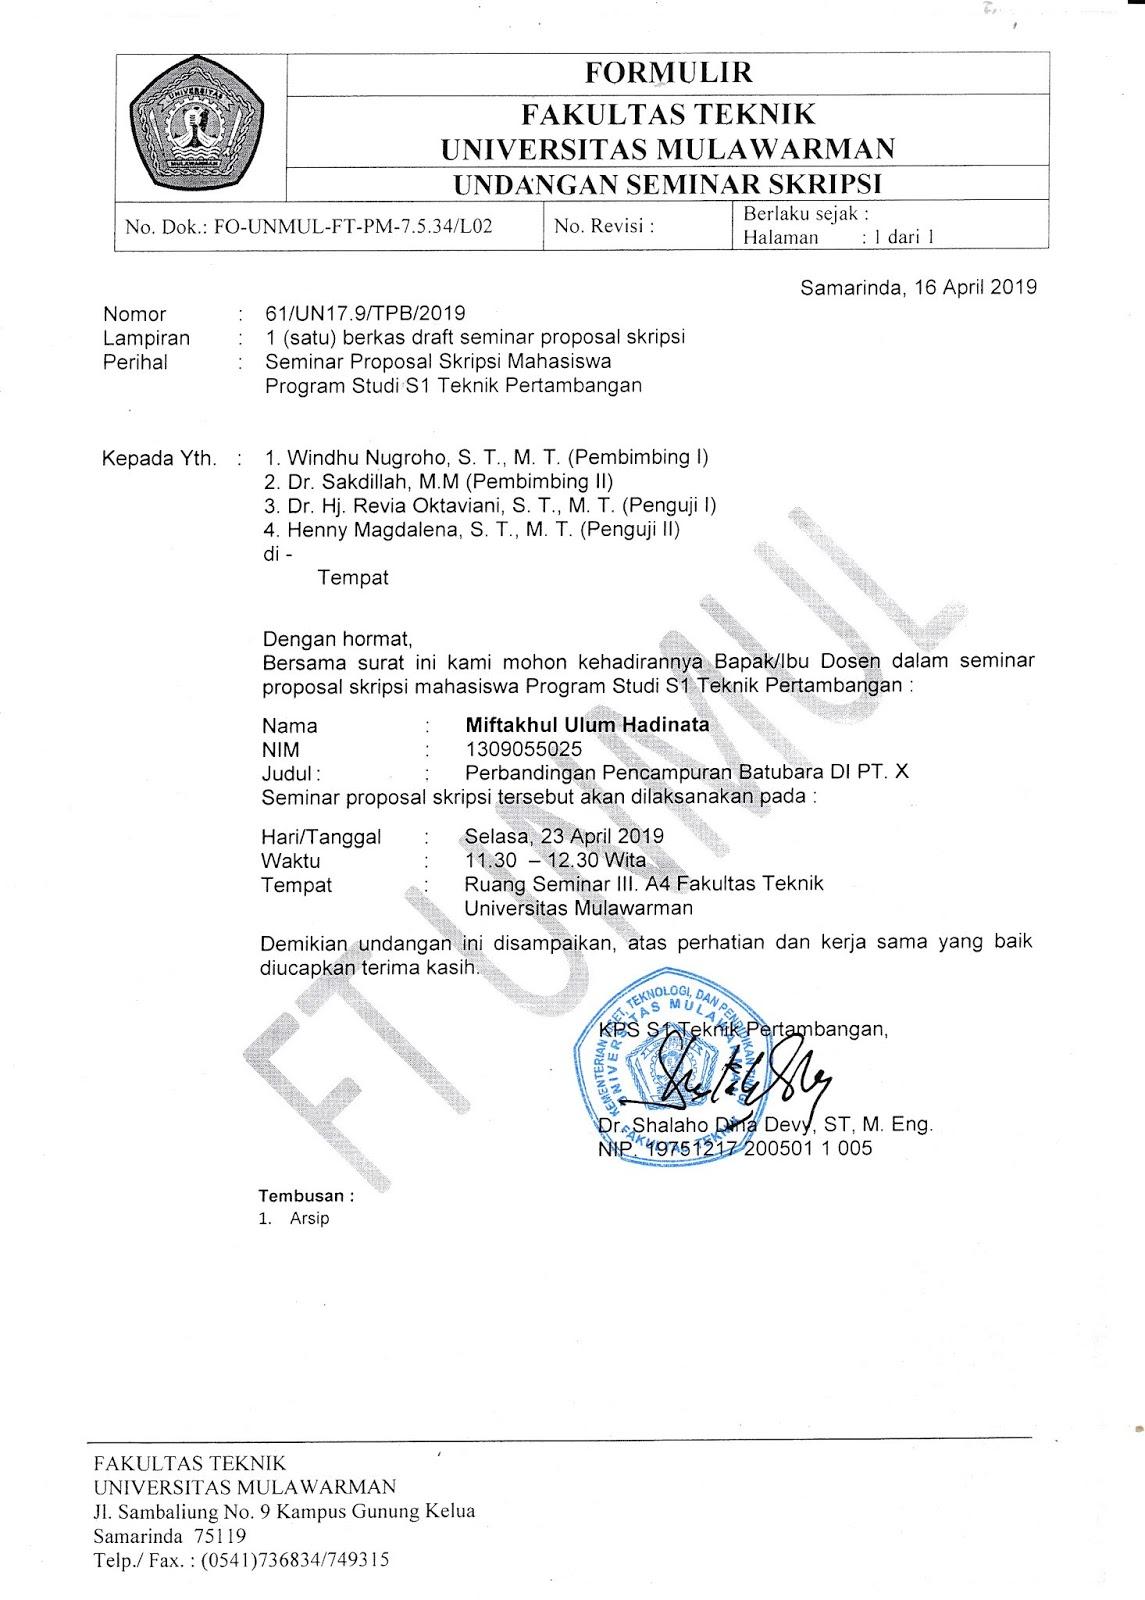 Proposal Skripsi Miftakul Ulum Hadinata 1309055025 Selasa 23 April